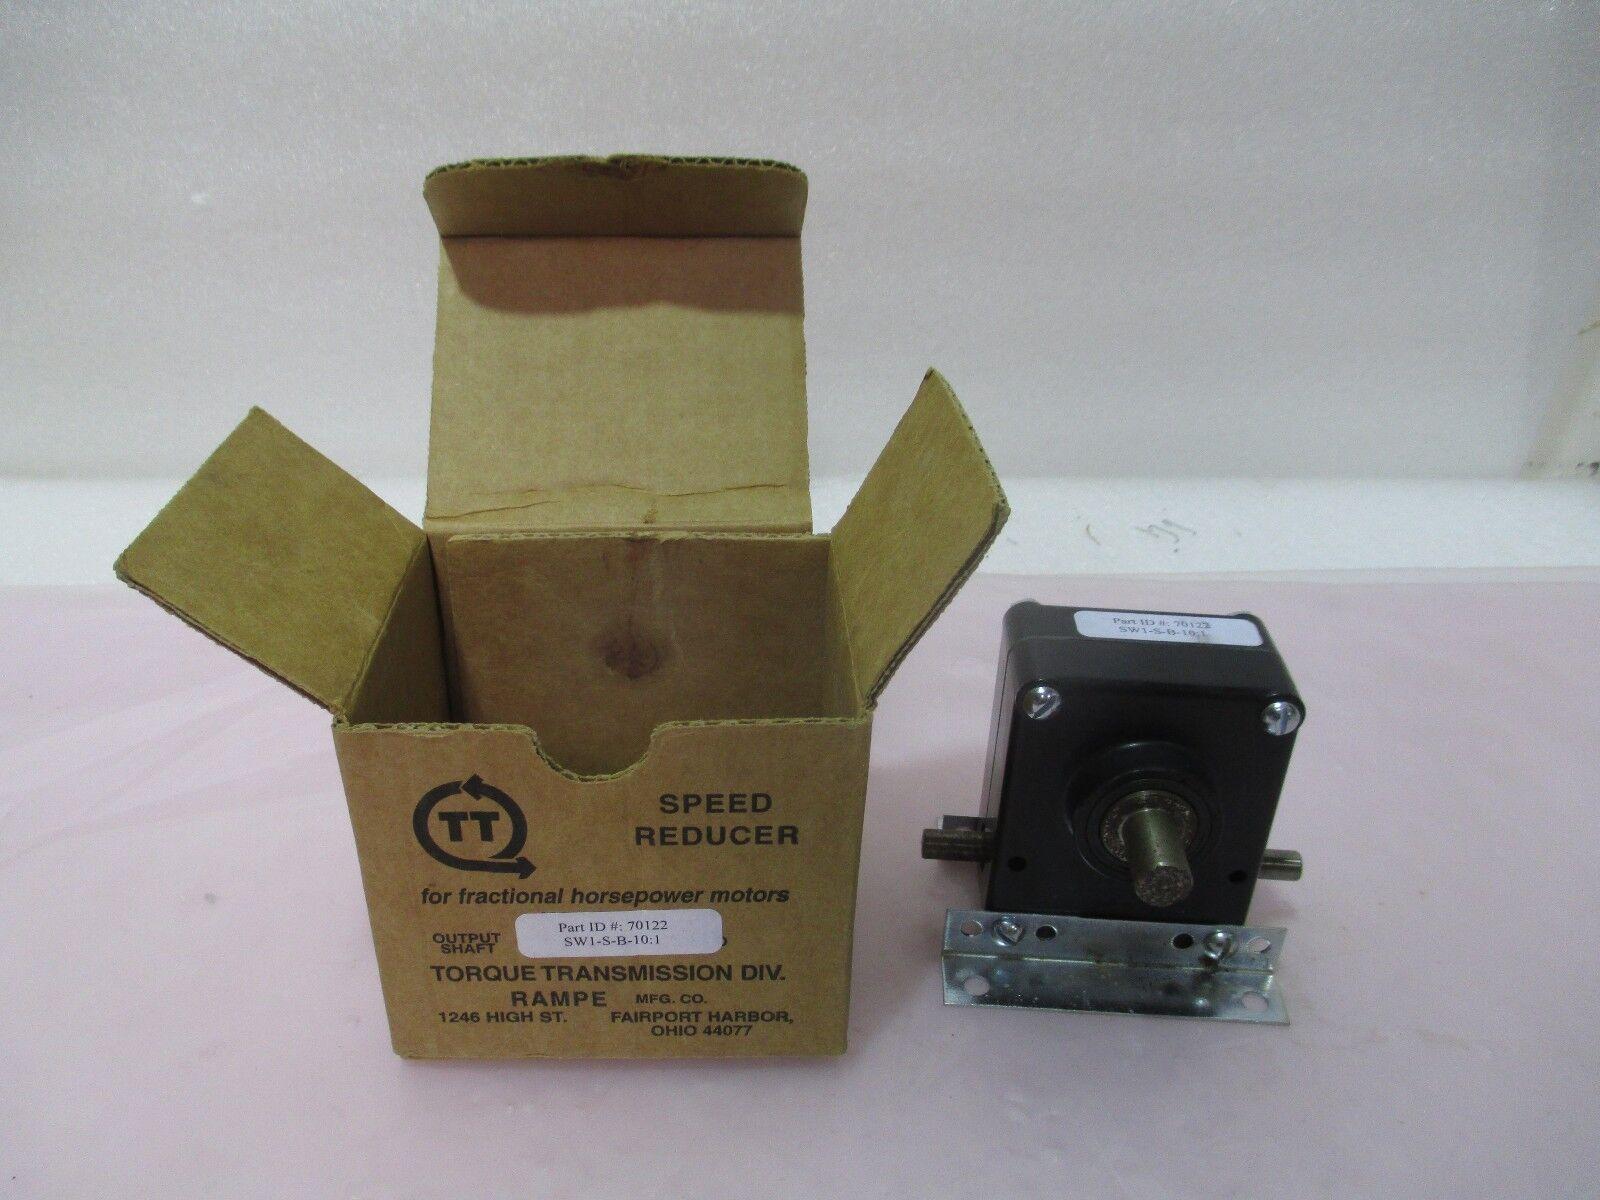 Torque Transmission 70122 Speed Reducer, Motor, SW1-S-B-10:1, 420966